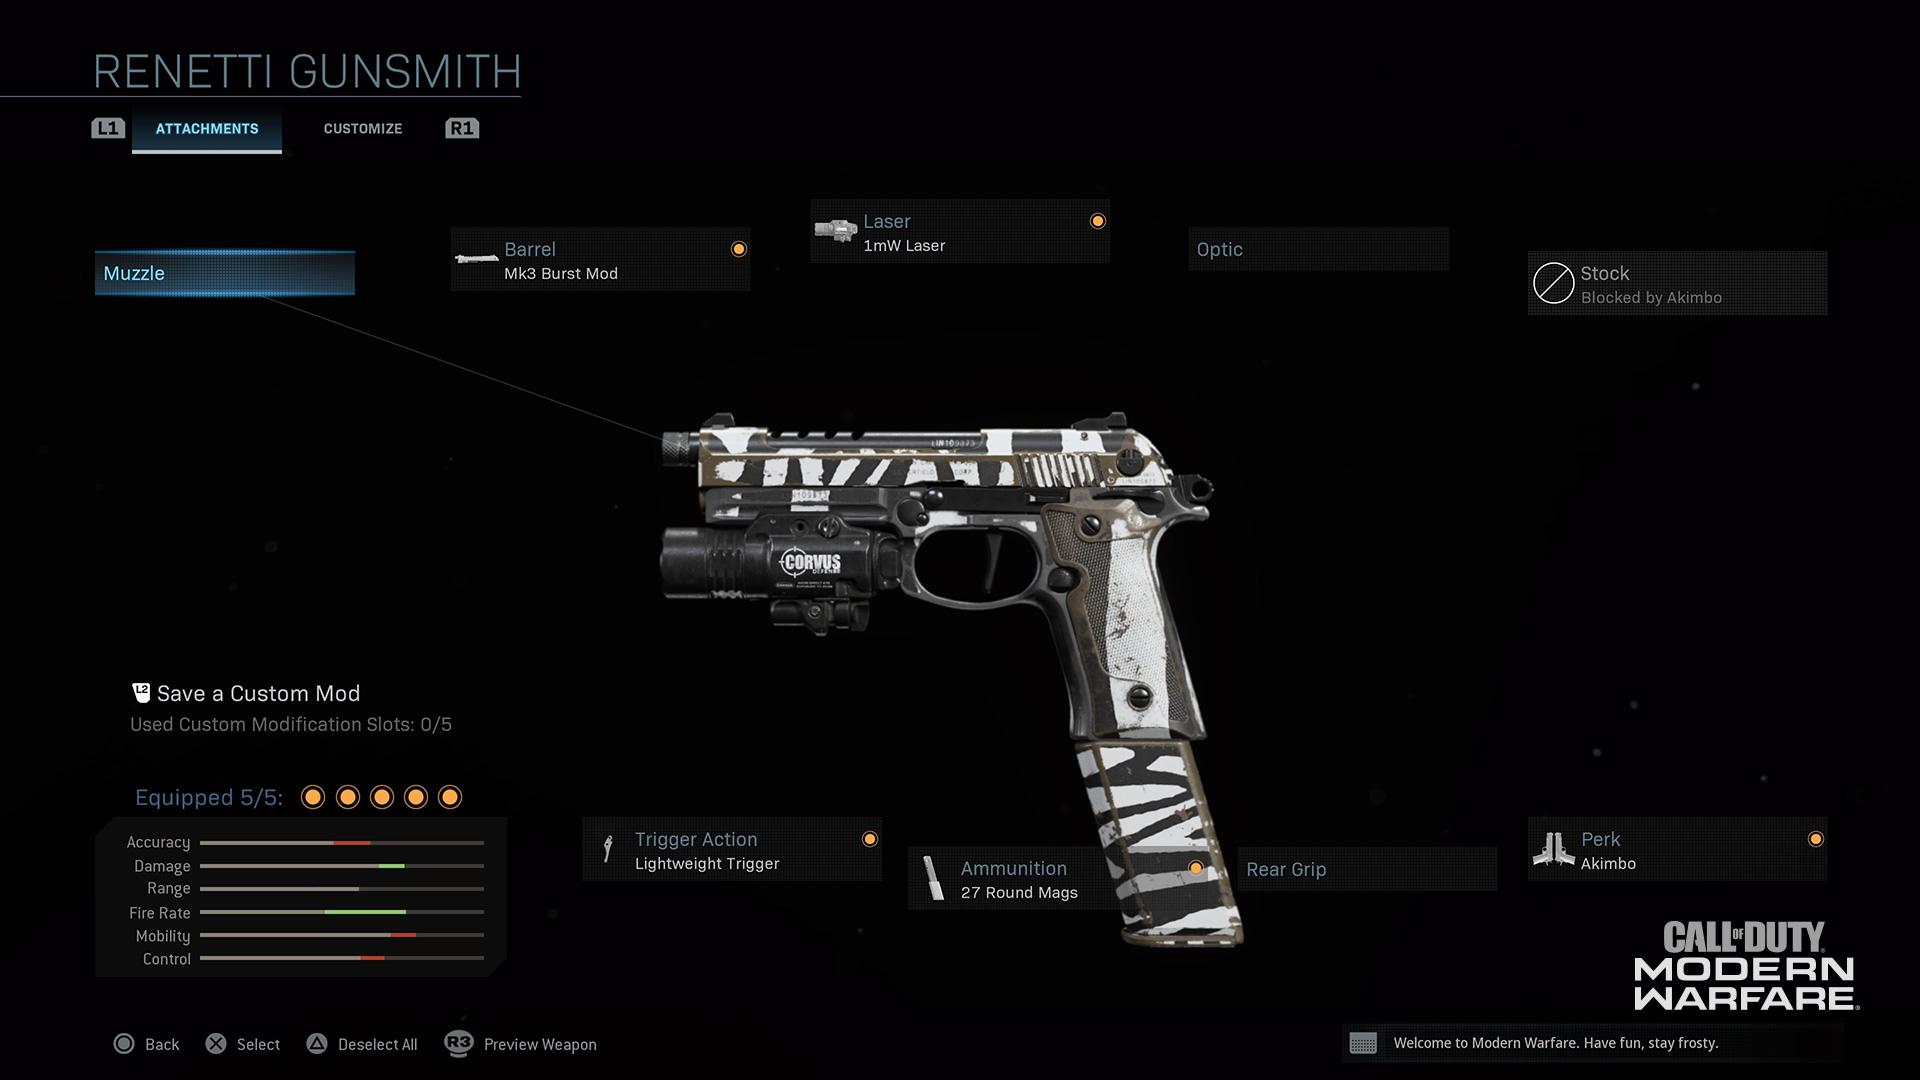 Modern Warfare® Weapon Detail: Renetti - Image 1